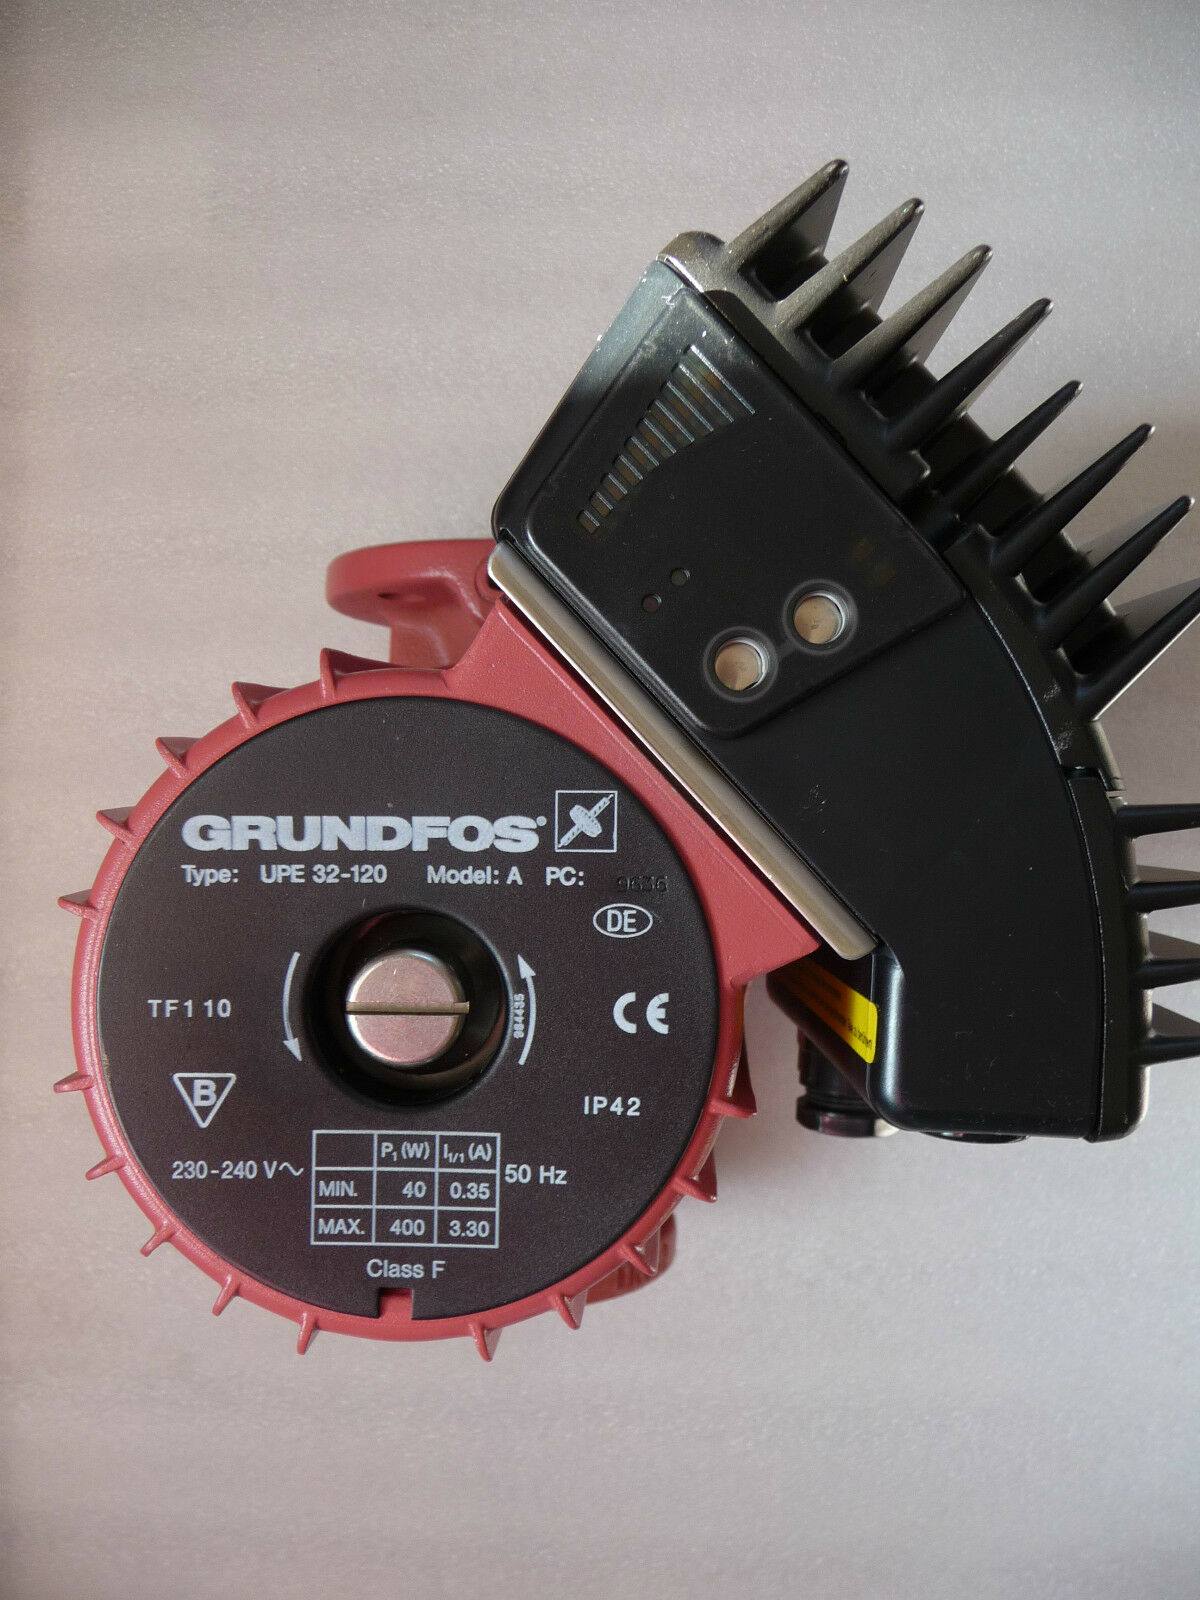 Grundfos UPE 32 - 120 Heizungspumpe 230 Volt Umwälzpumpe 220 mm NEU P3472/16